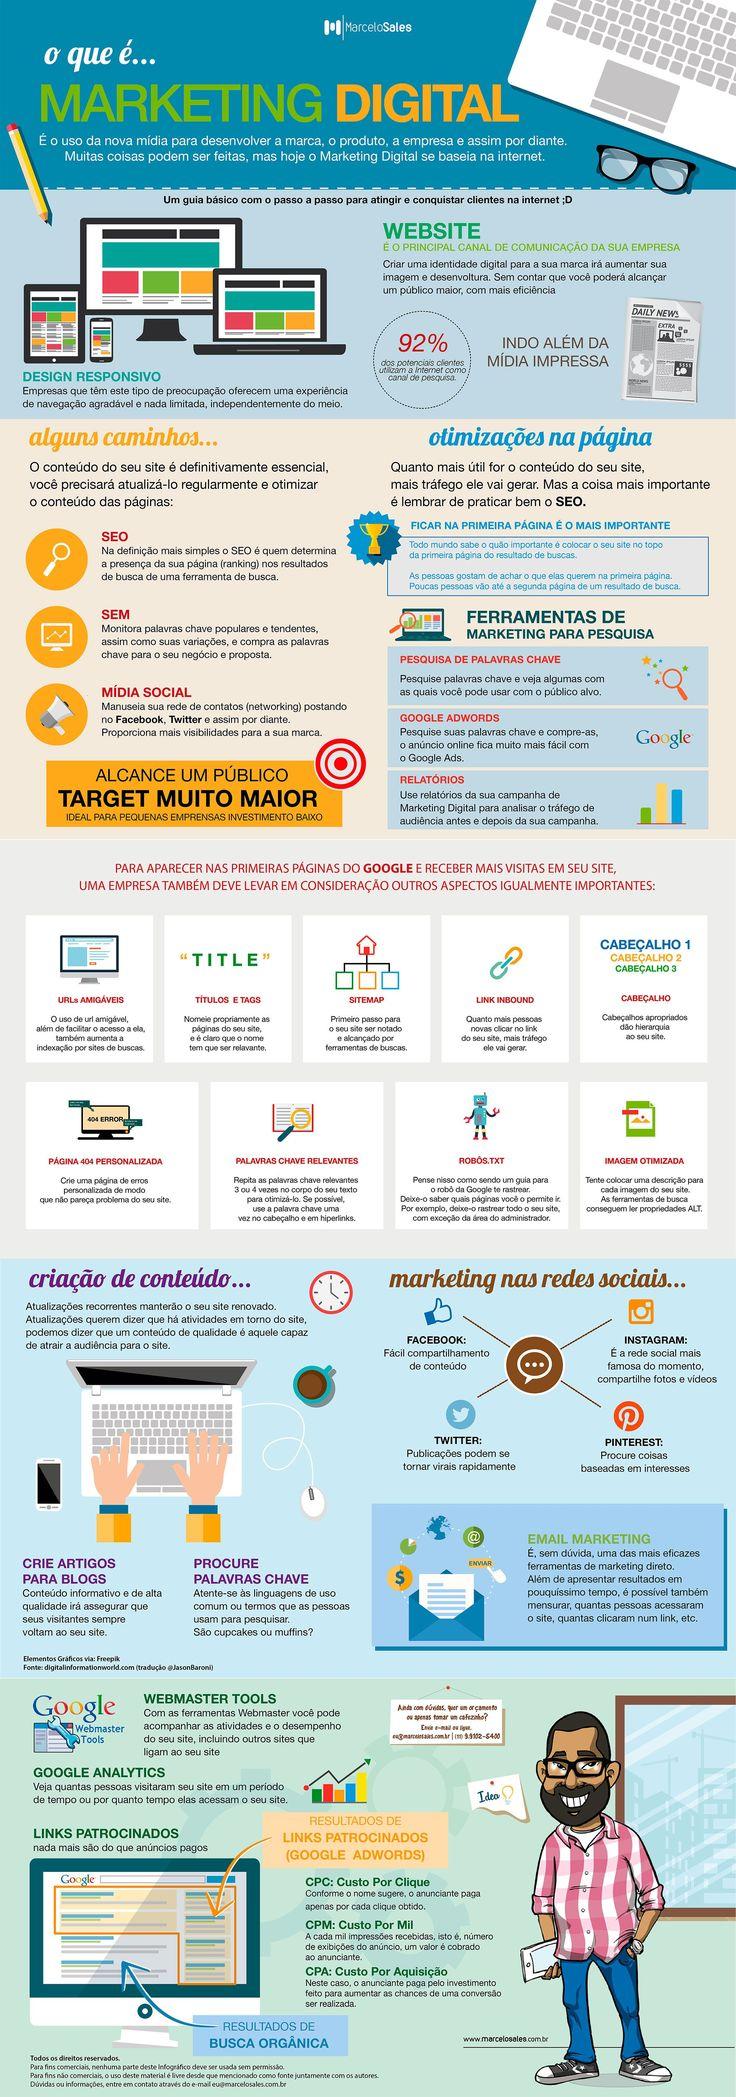 21 best Super SEO Strategies images on Pinterest   Digital marketing ...